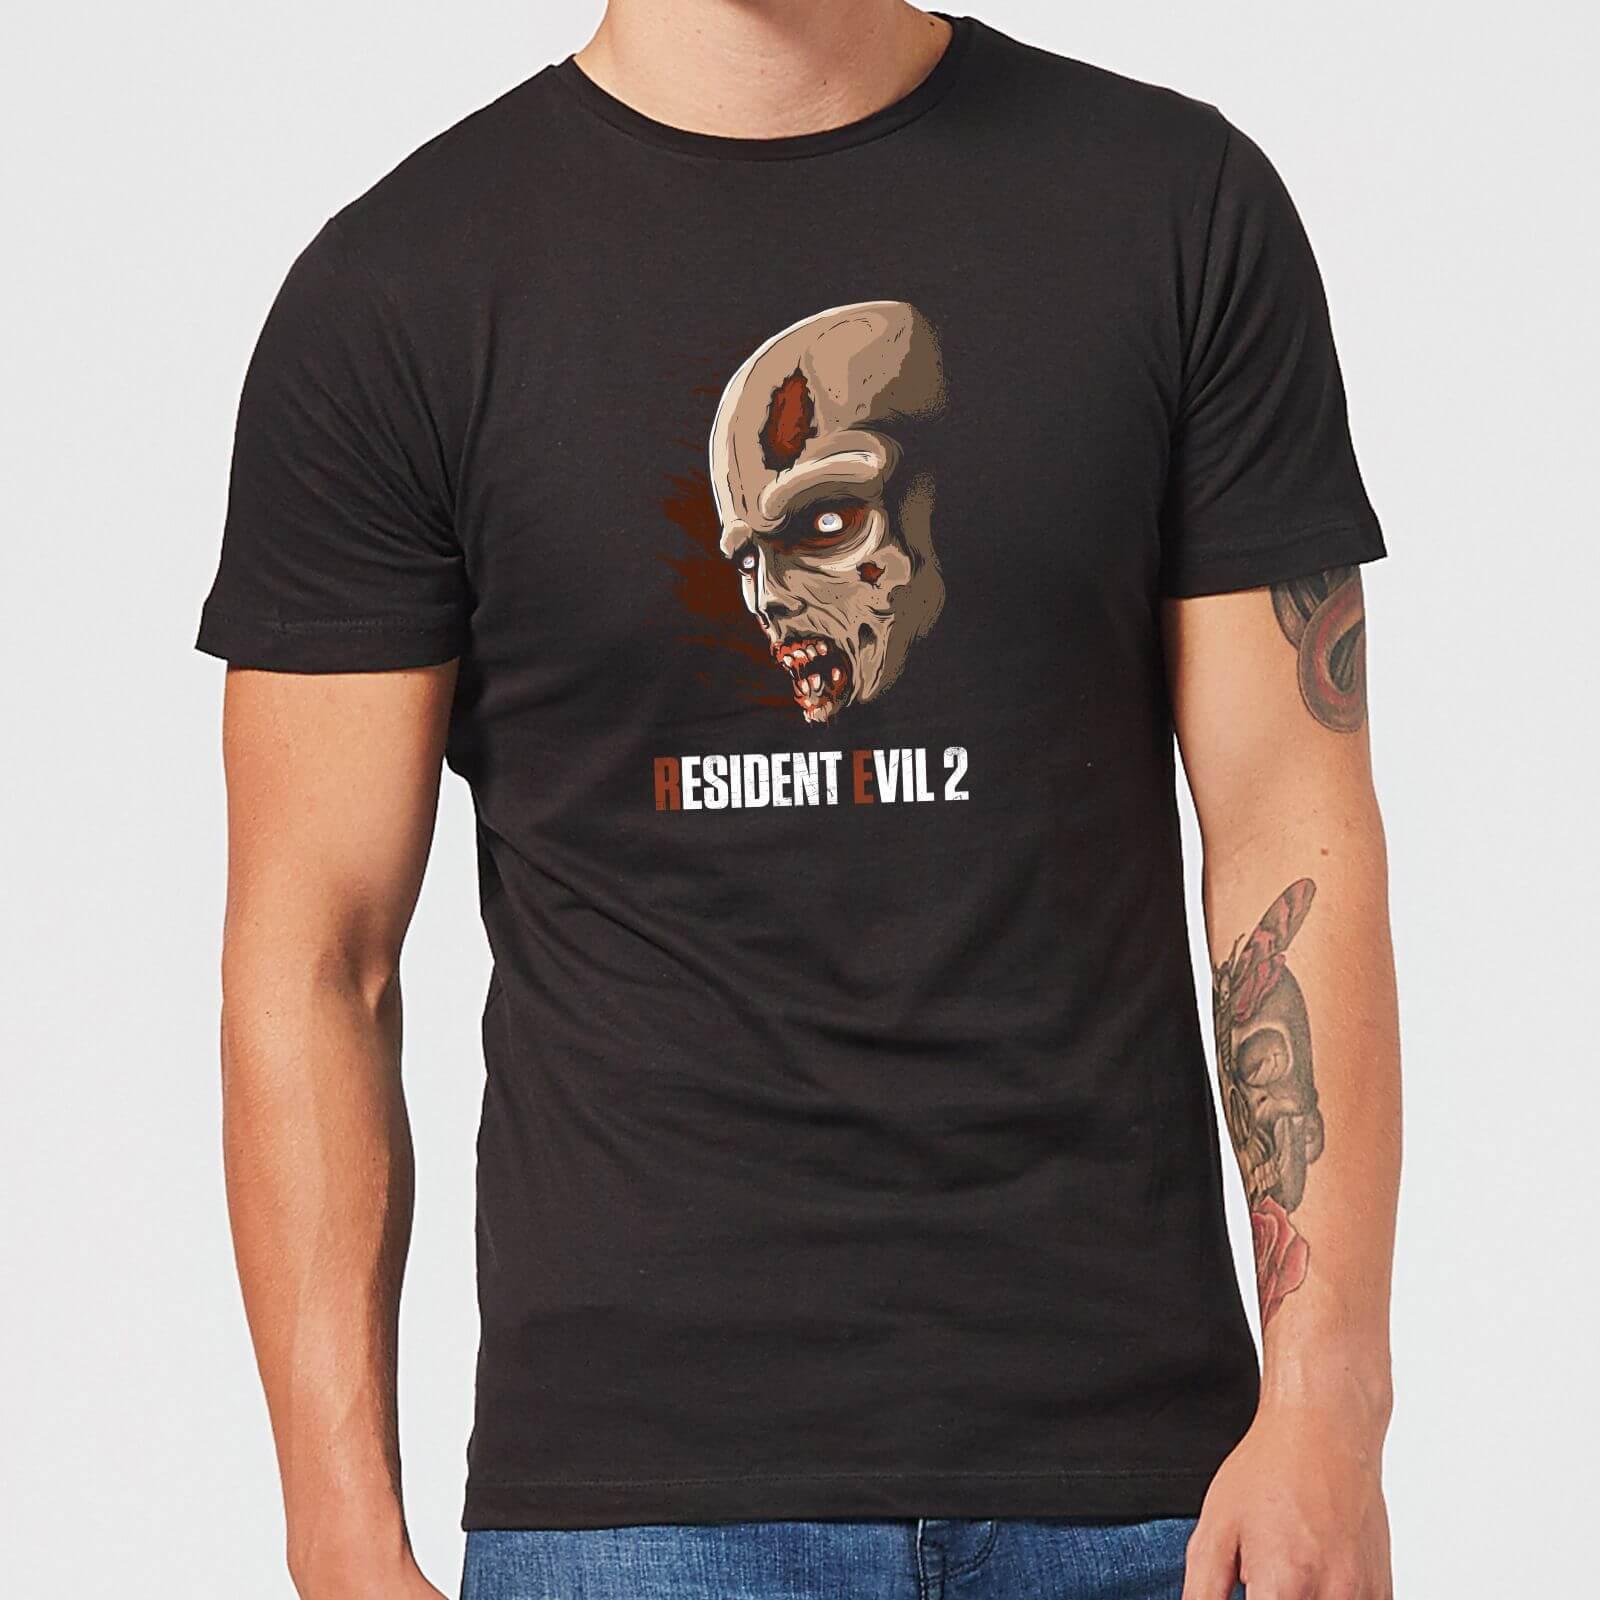 Resident Evil 2 Zombie Face Men's T-Shirt - Black - 5XL - Black